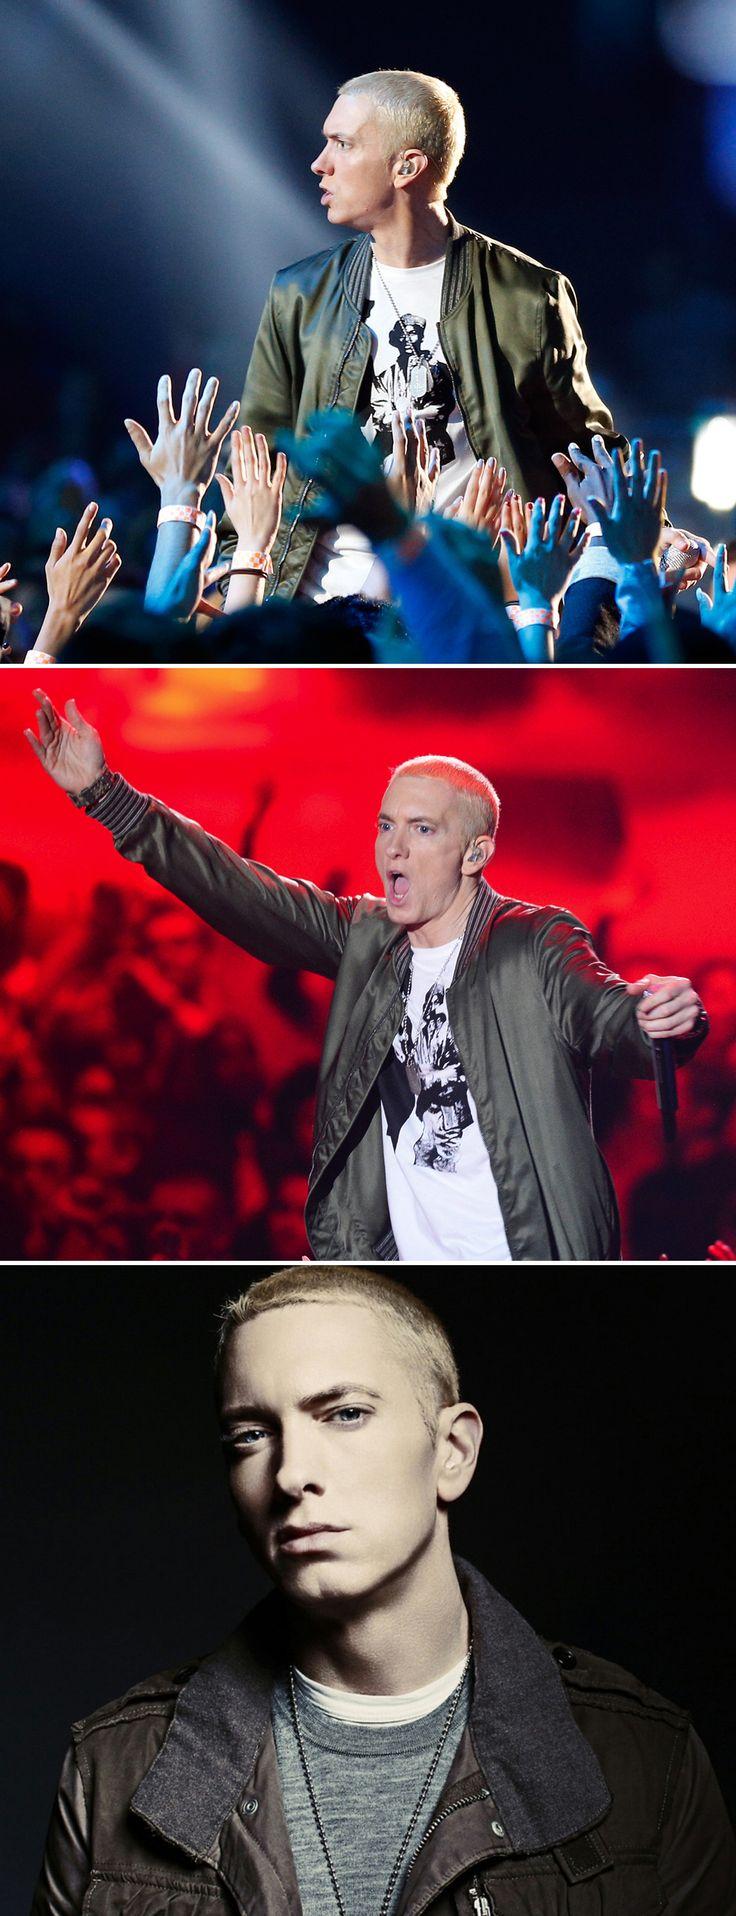 Pictures of eminem and kim mathers kim wedding eminem kim car tuning - The Widely Considered Global God Of Rap Eminem Turns